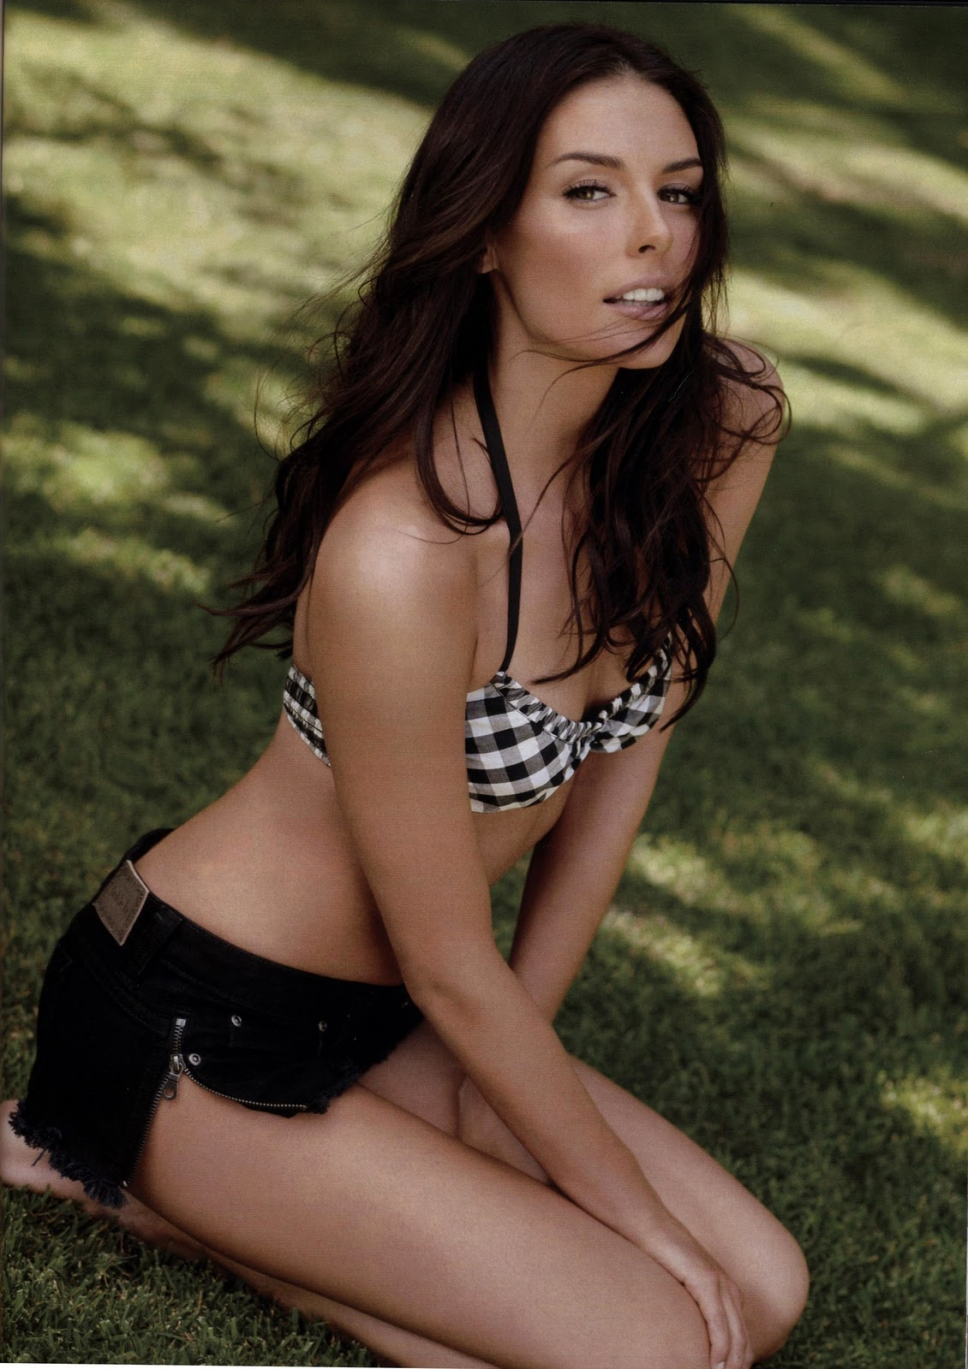 Taylor Cole in a bikini